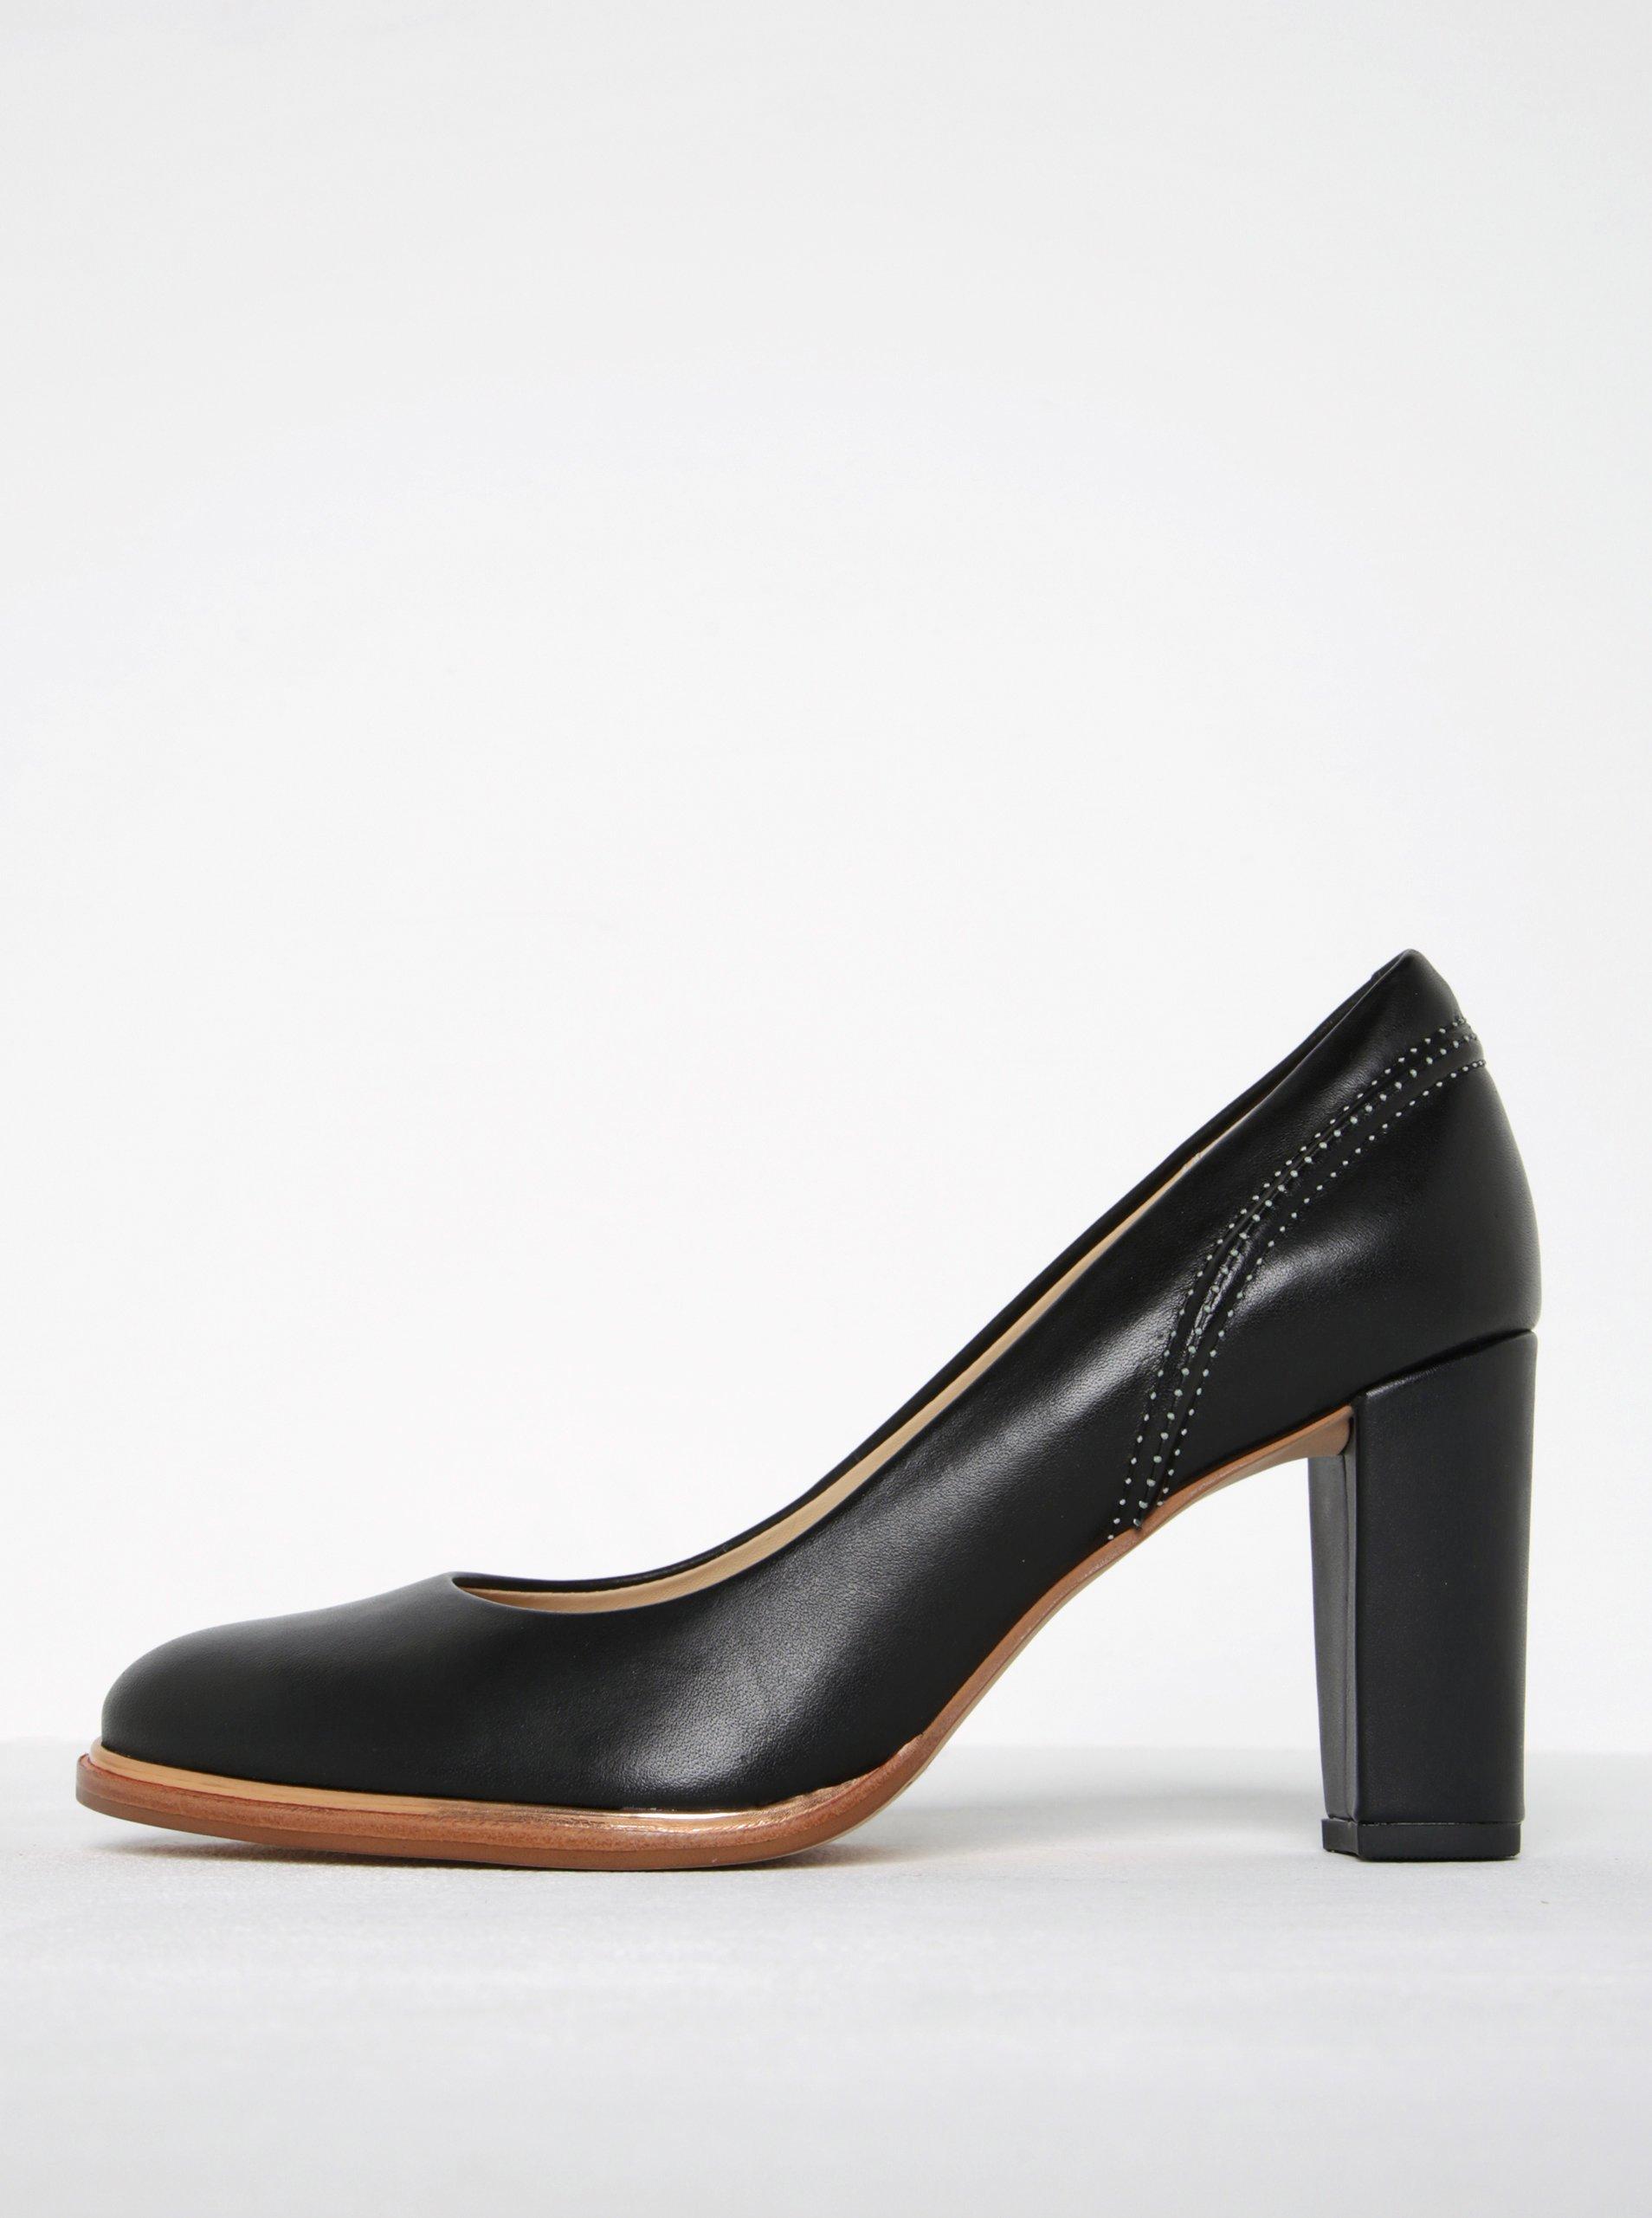 Čierne dámske kožené lodičky Clarks Ellis Edith  6ef95844c0f